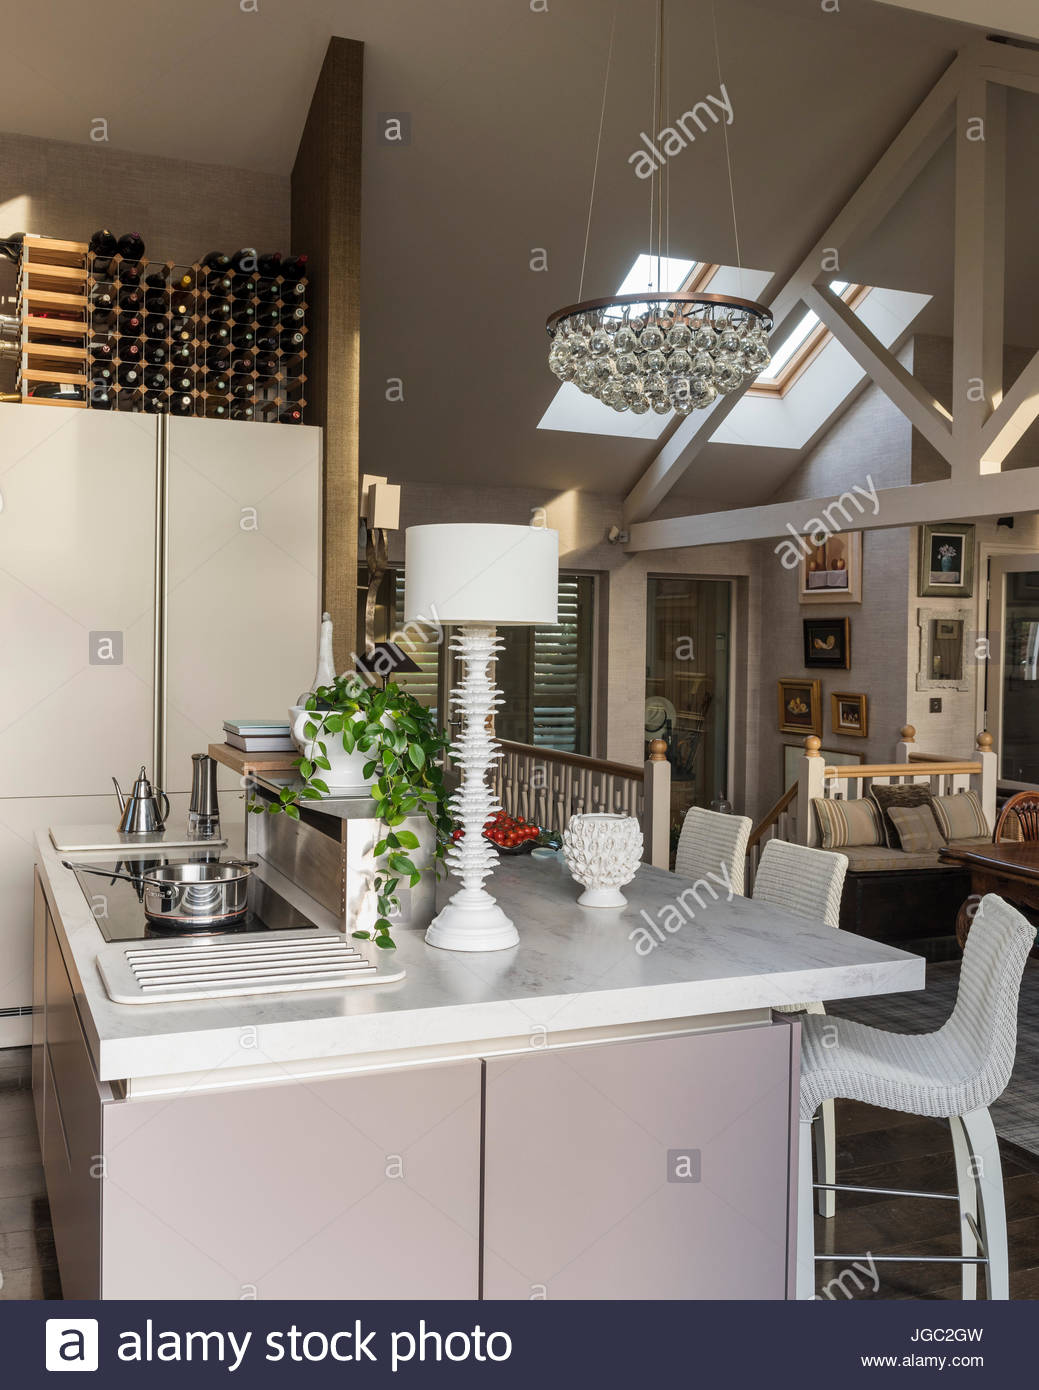 Lightbulb pendant and wine rack above breakfast bar in A-frame kitchen - Stock Image